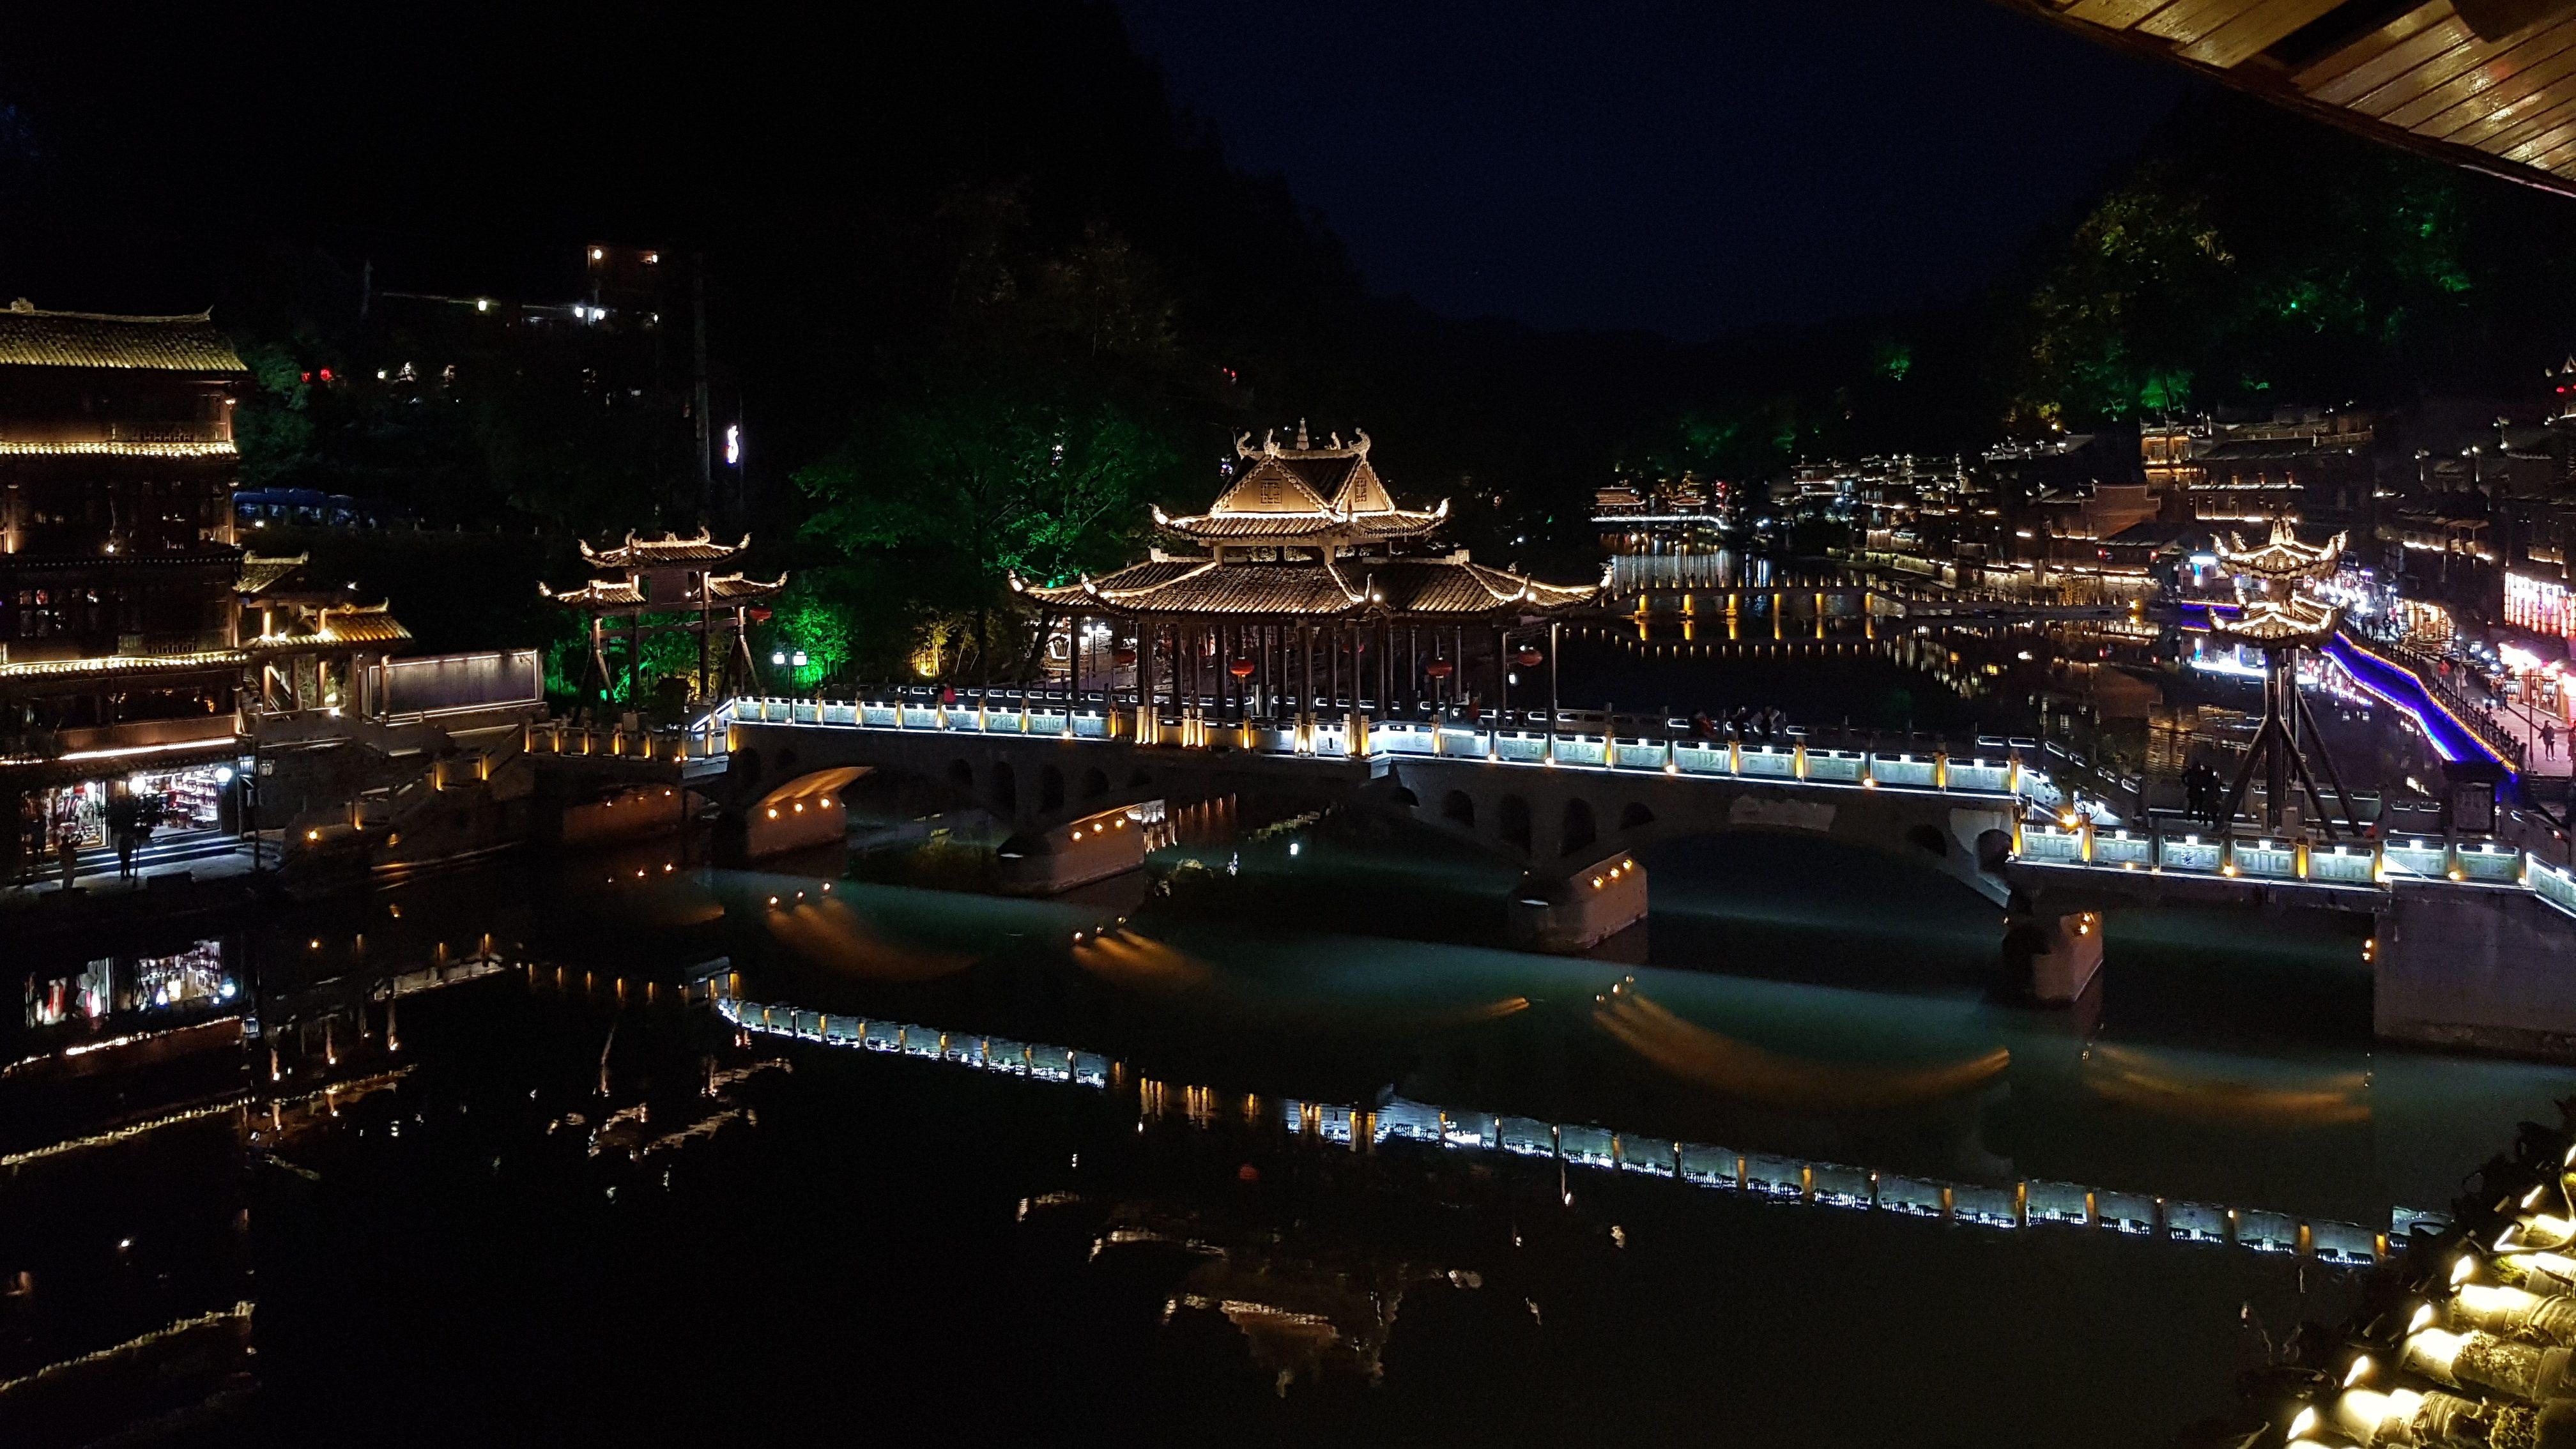 Fenghuang ved flodens bred